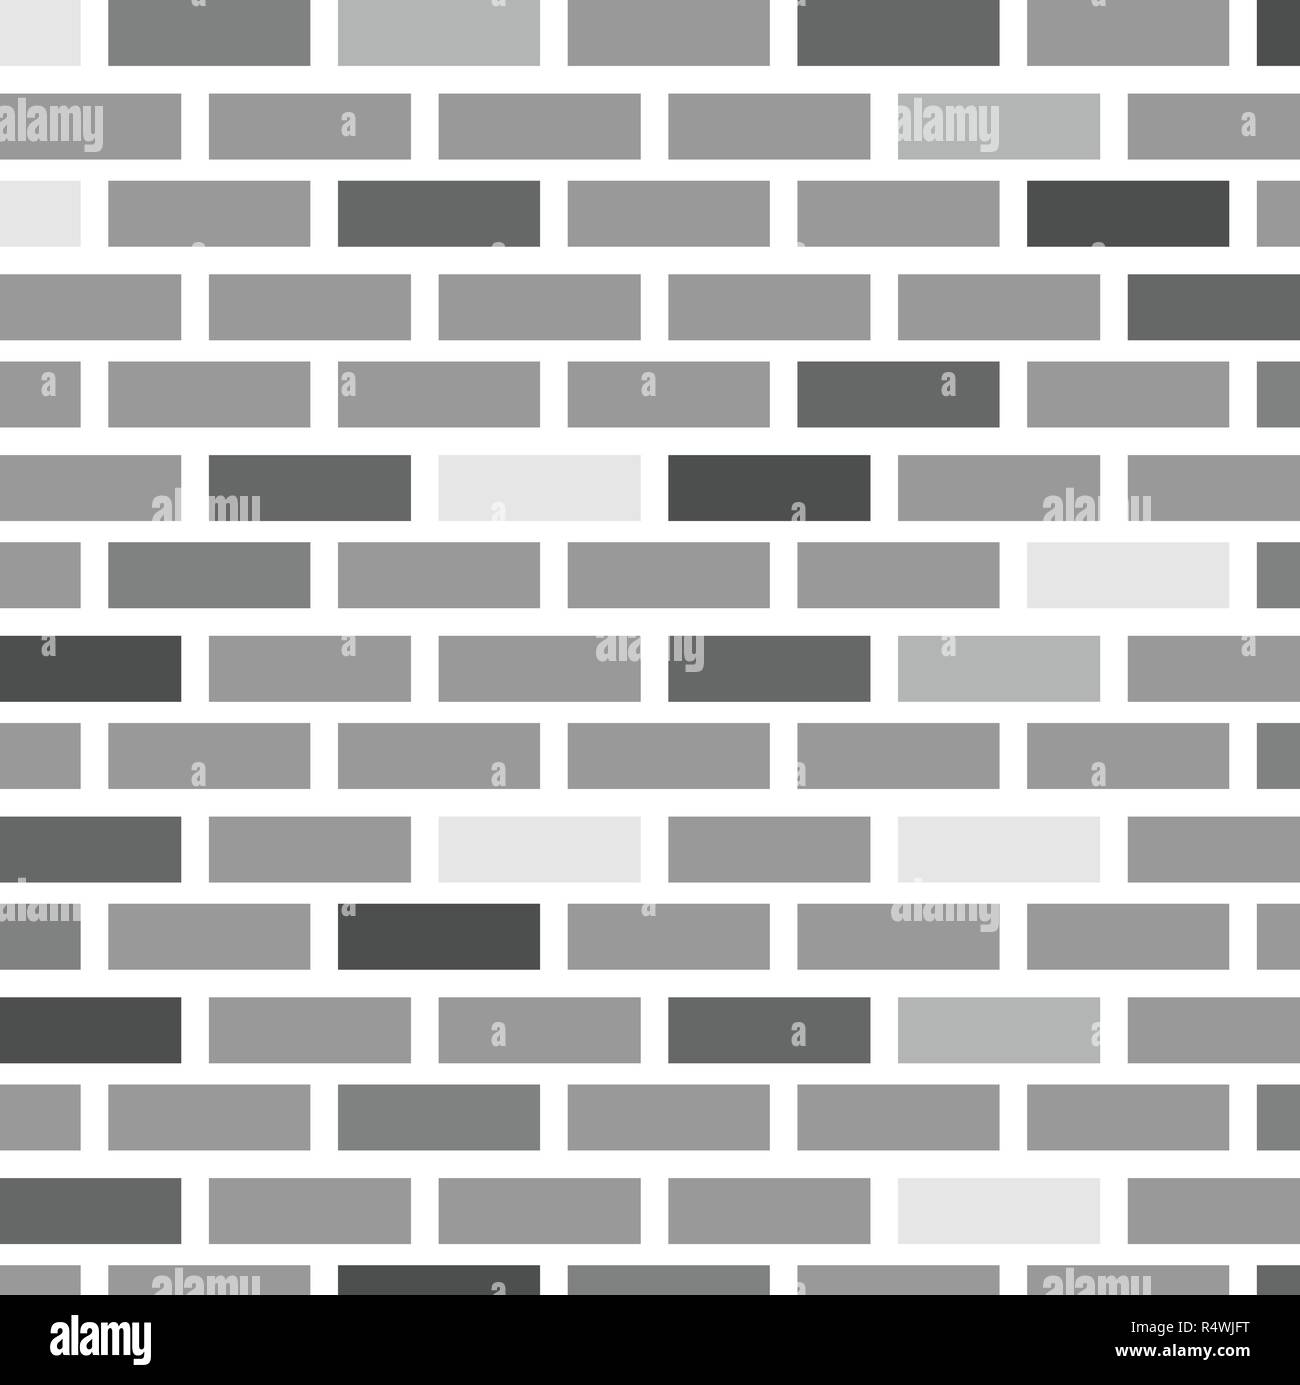 Vector Illustration Brick Wall Of Gray Bricks Of Different Colors